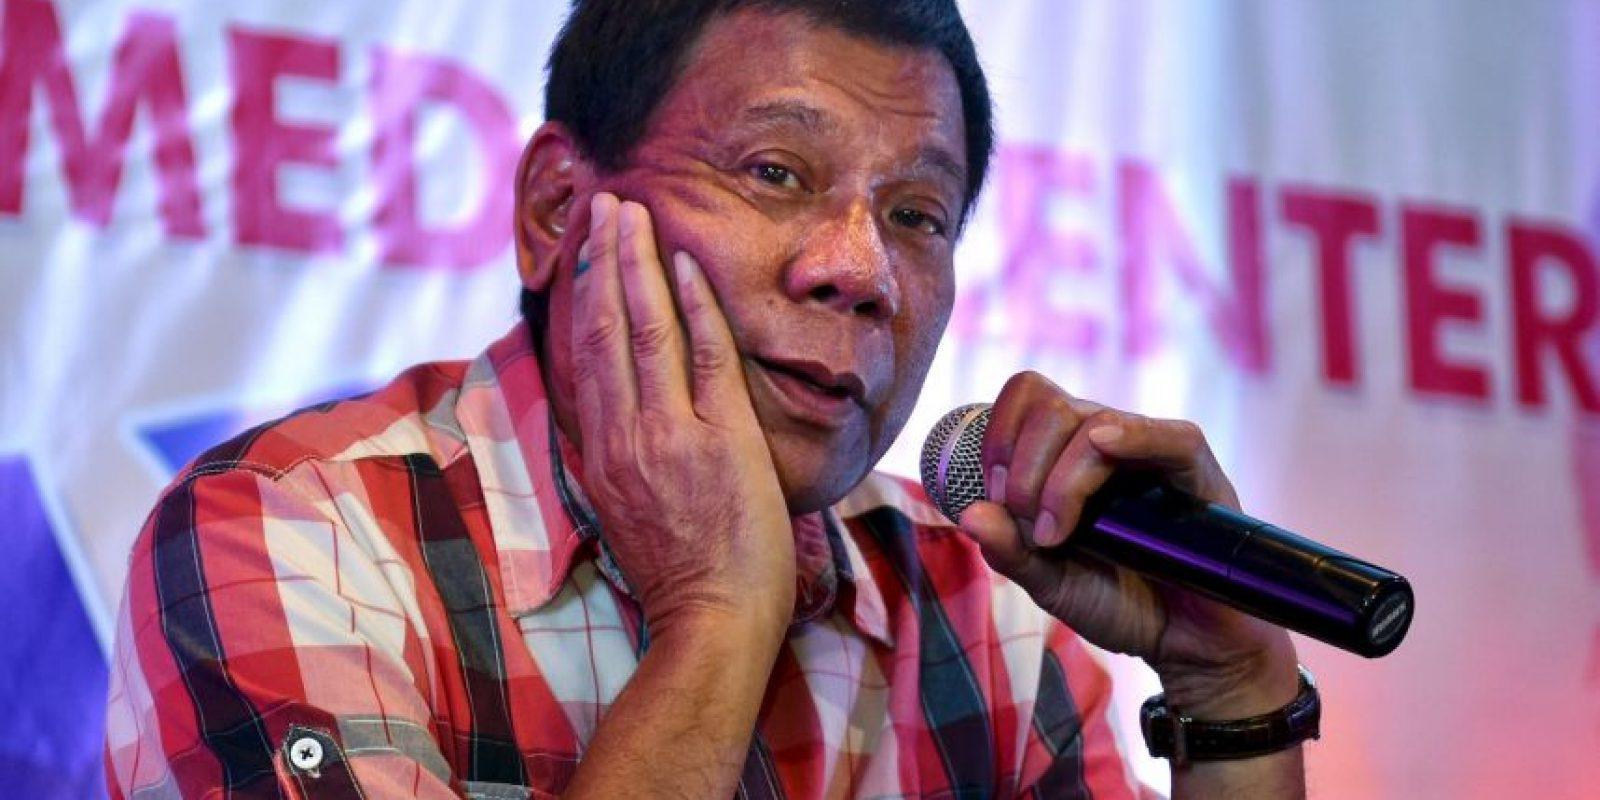 Getty Images Foto:Rodrigo Duterte, presidente de Filipinas, es conocido por su fuerte lenguaje